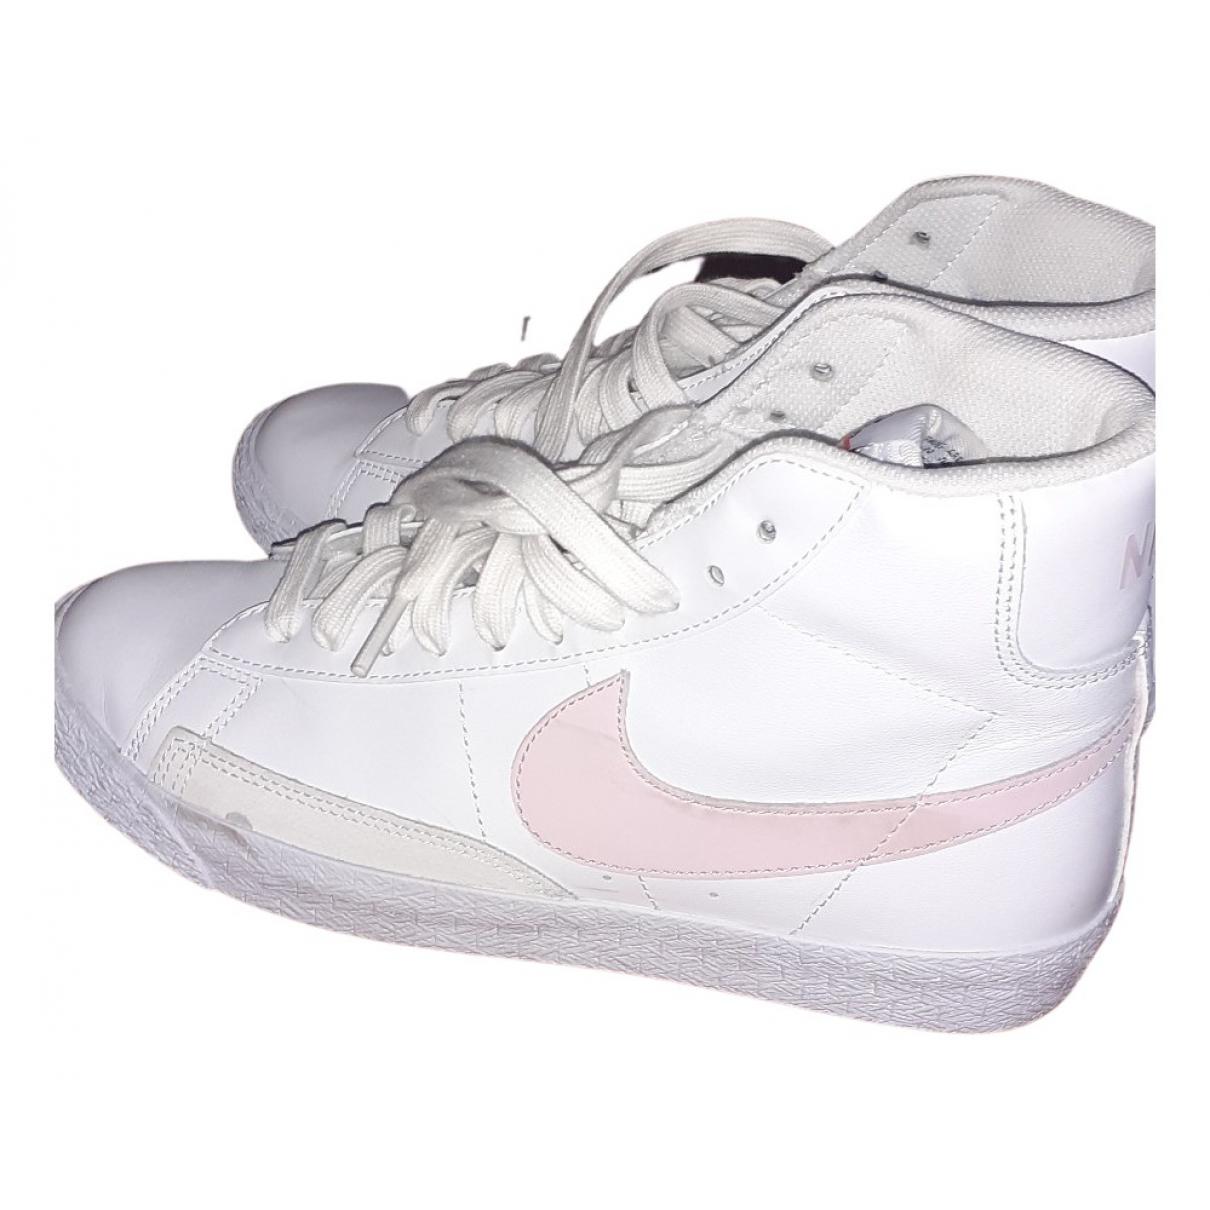 Nike - Baskets Blazer pour femme en cuir - blanc